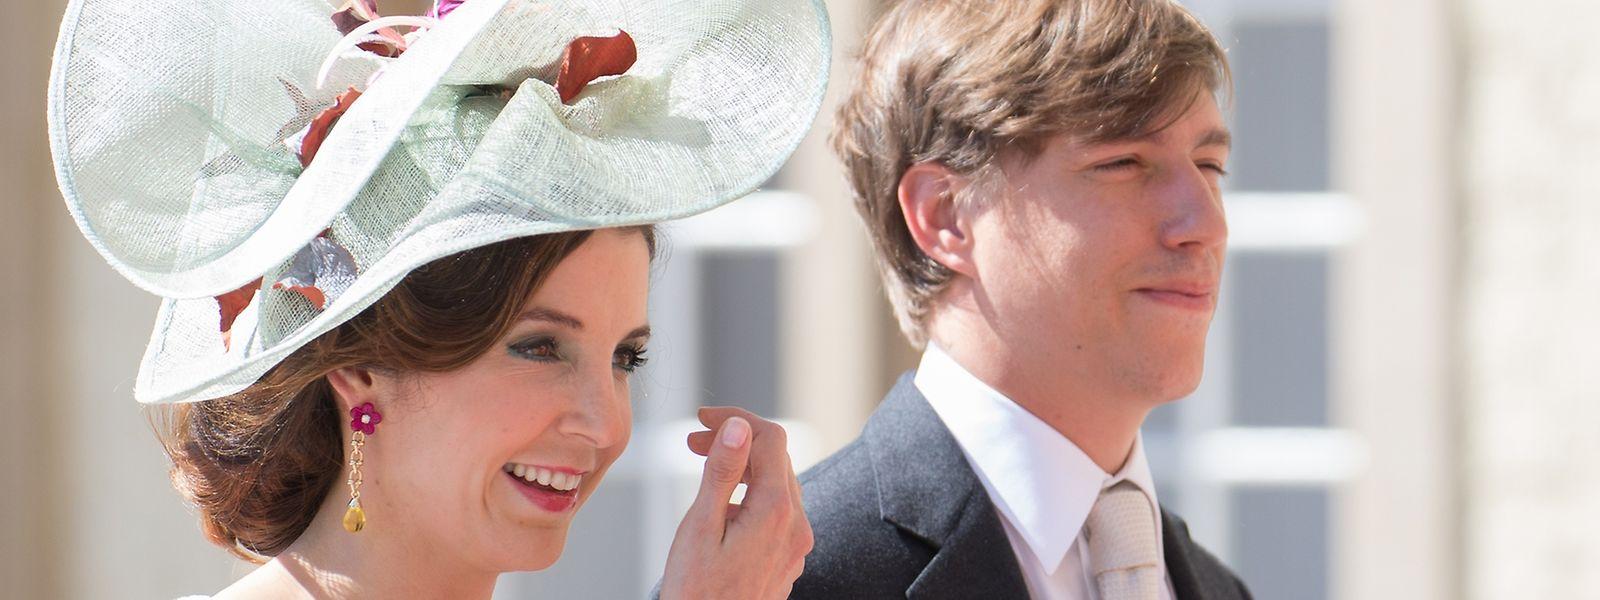 Prinz Louis und seine Frau Tessy am Nationalfeiertag 2016